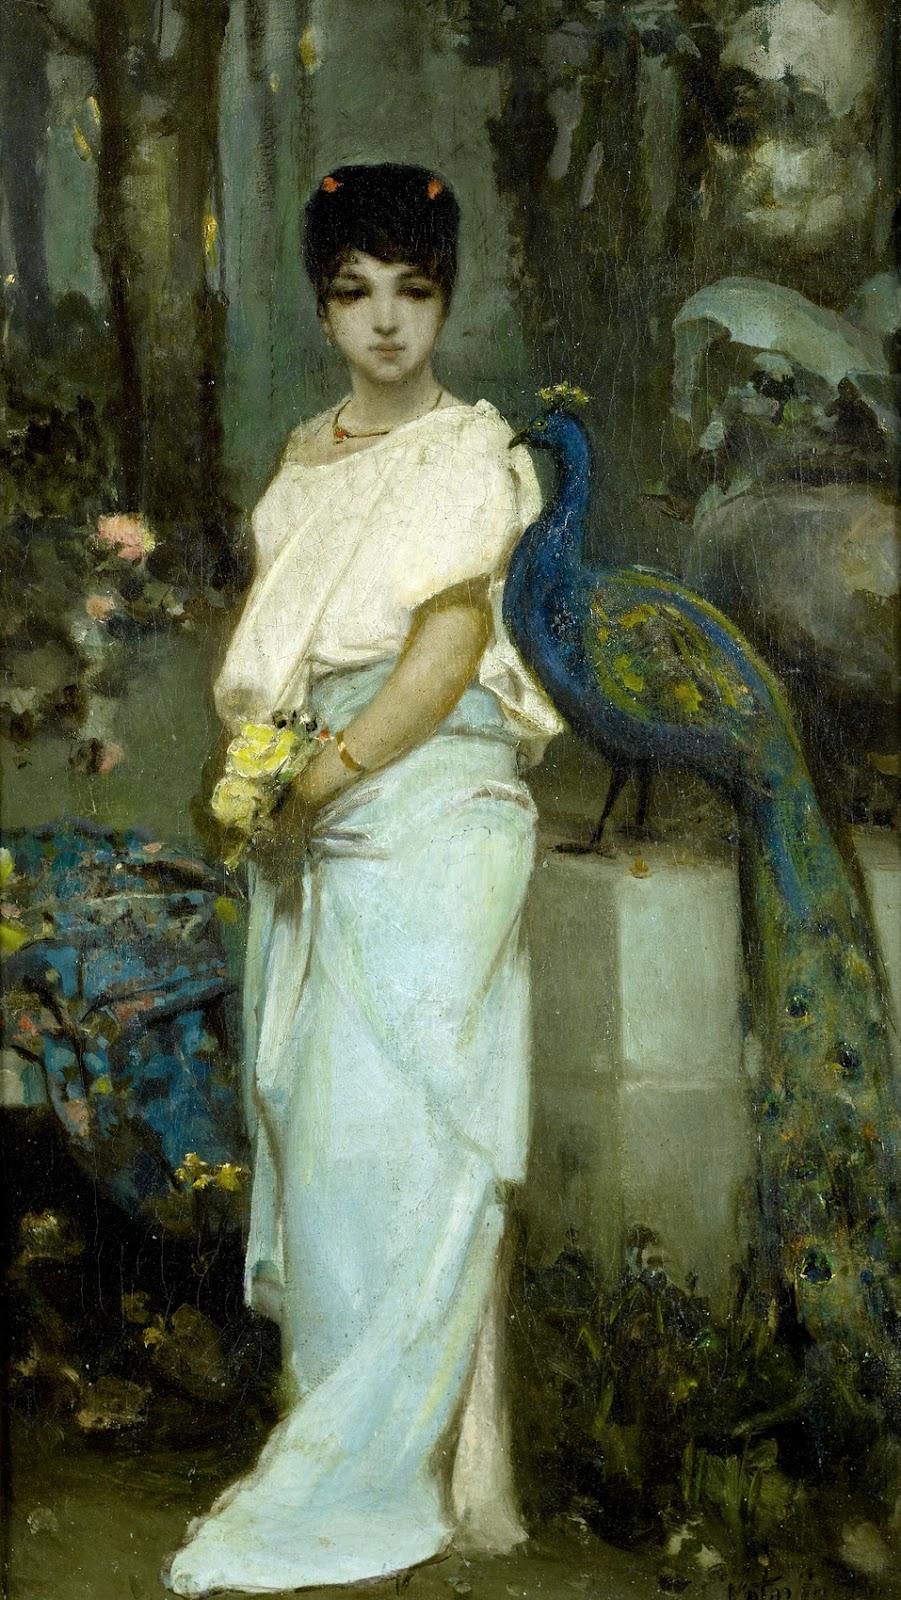 MOLODAY-DAMA-S-PAVLINOM-Young-Lady-with-a-Peacock_62.5-K-36.6_K.M._CASTNOE-SOBRANIE.jpg